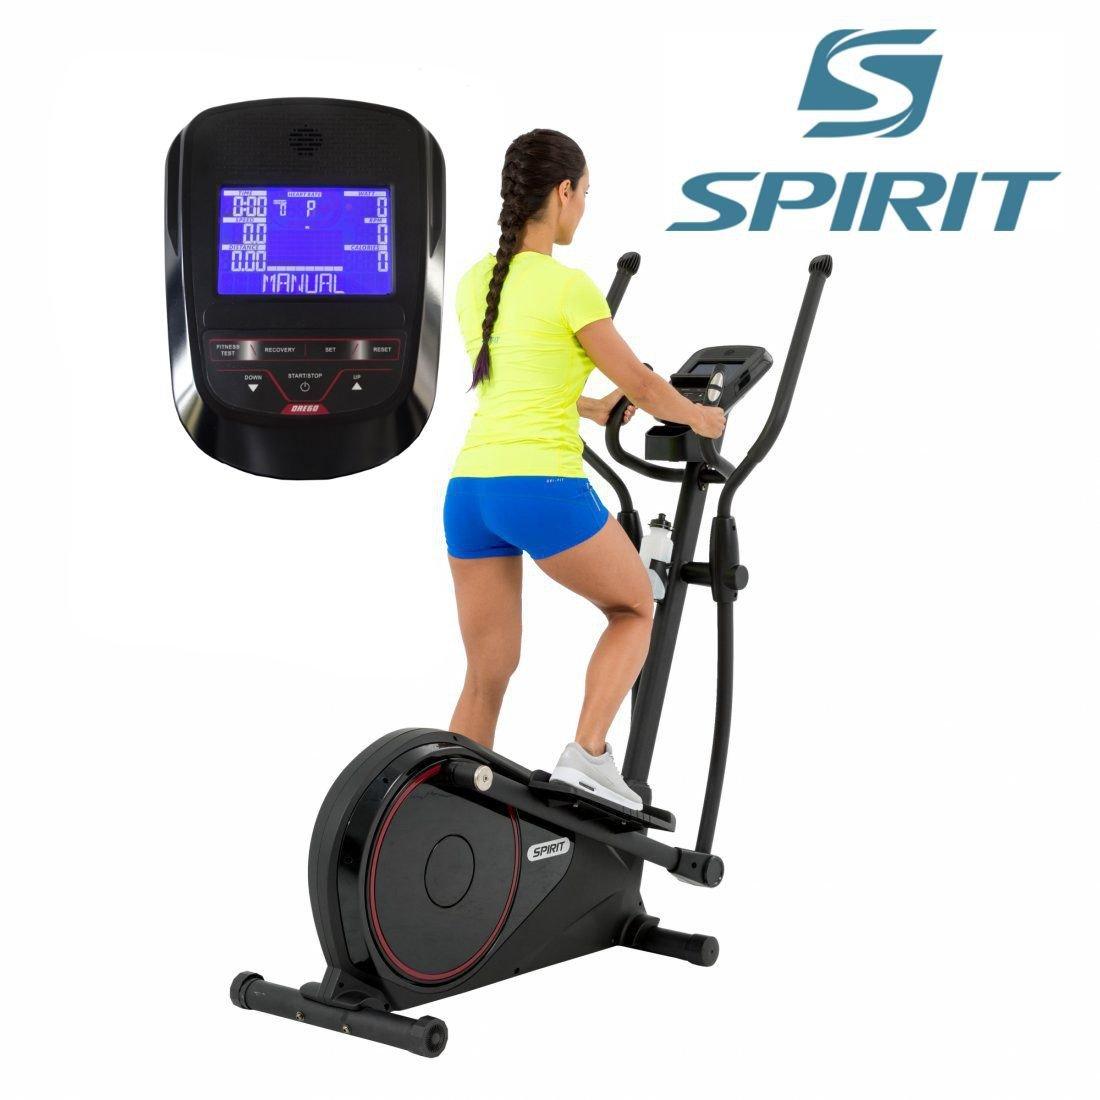 Spirit profesional Cross Trainer Dre 60 Ellipse Trainer bicicleta estática Fitness: Amazon.es: Deportes y aire libre